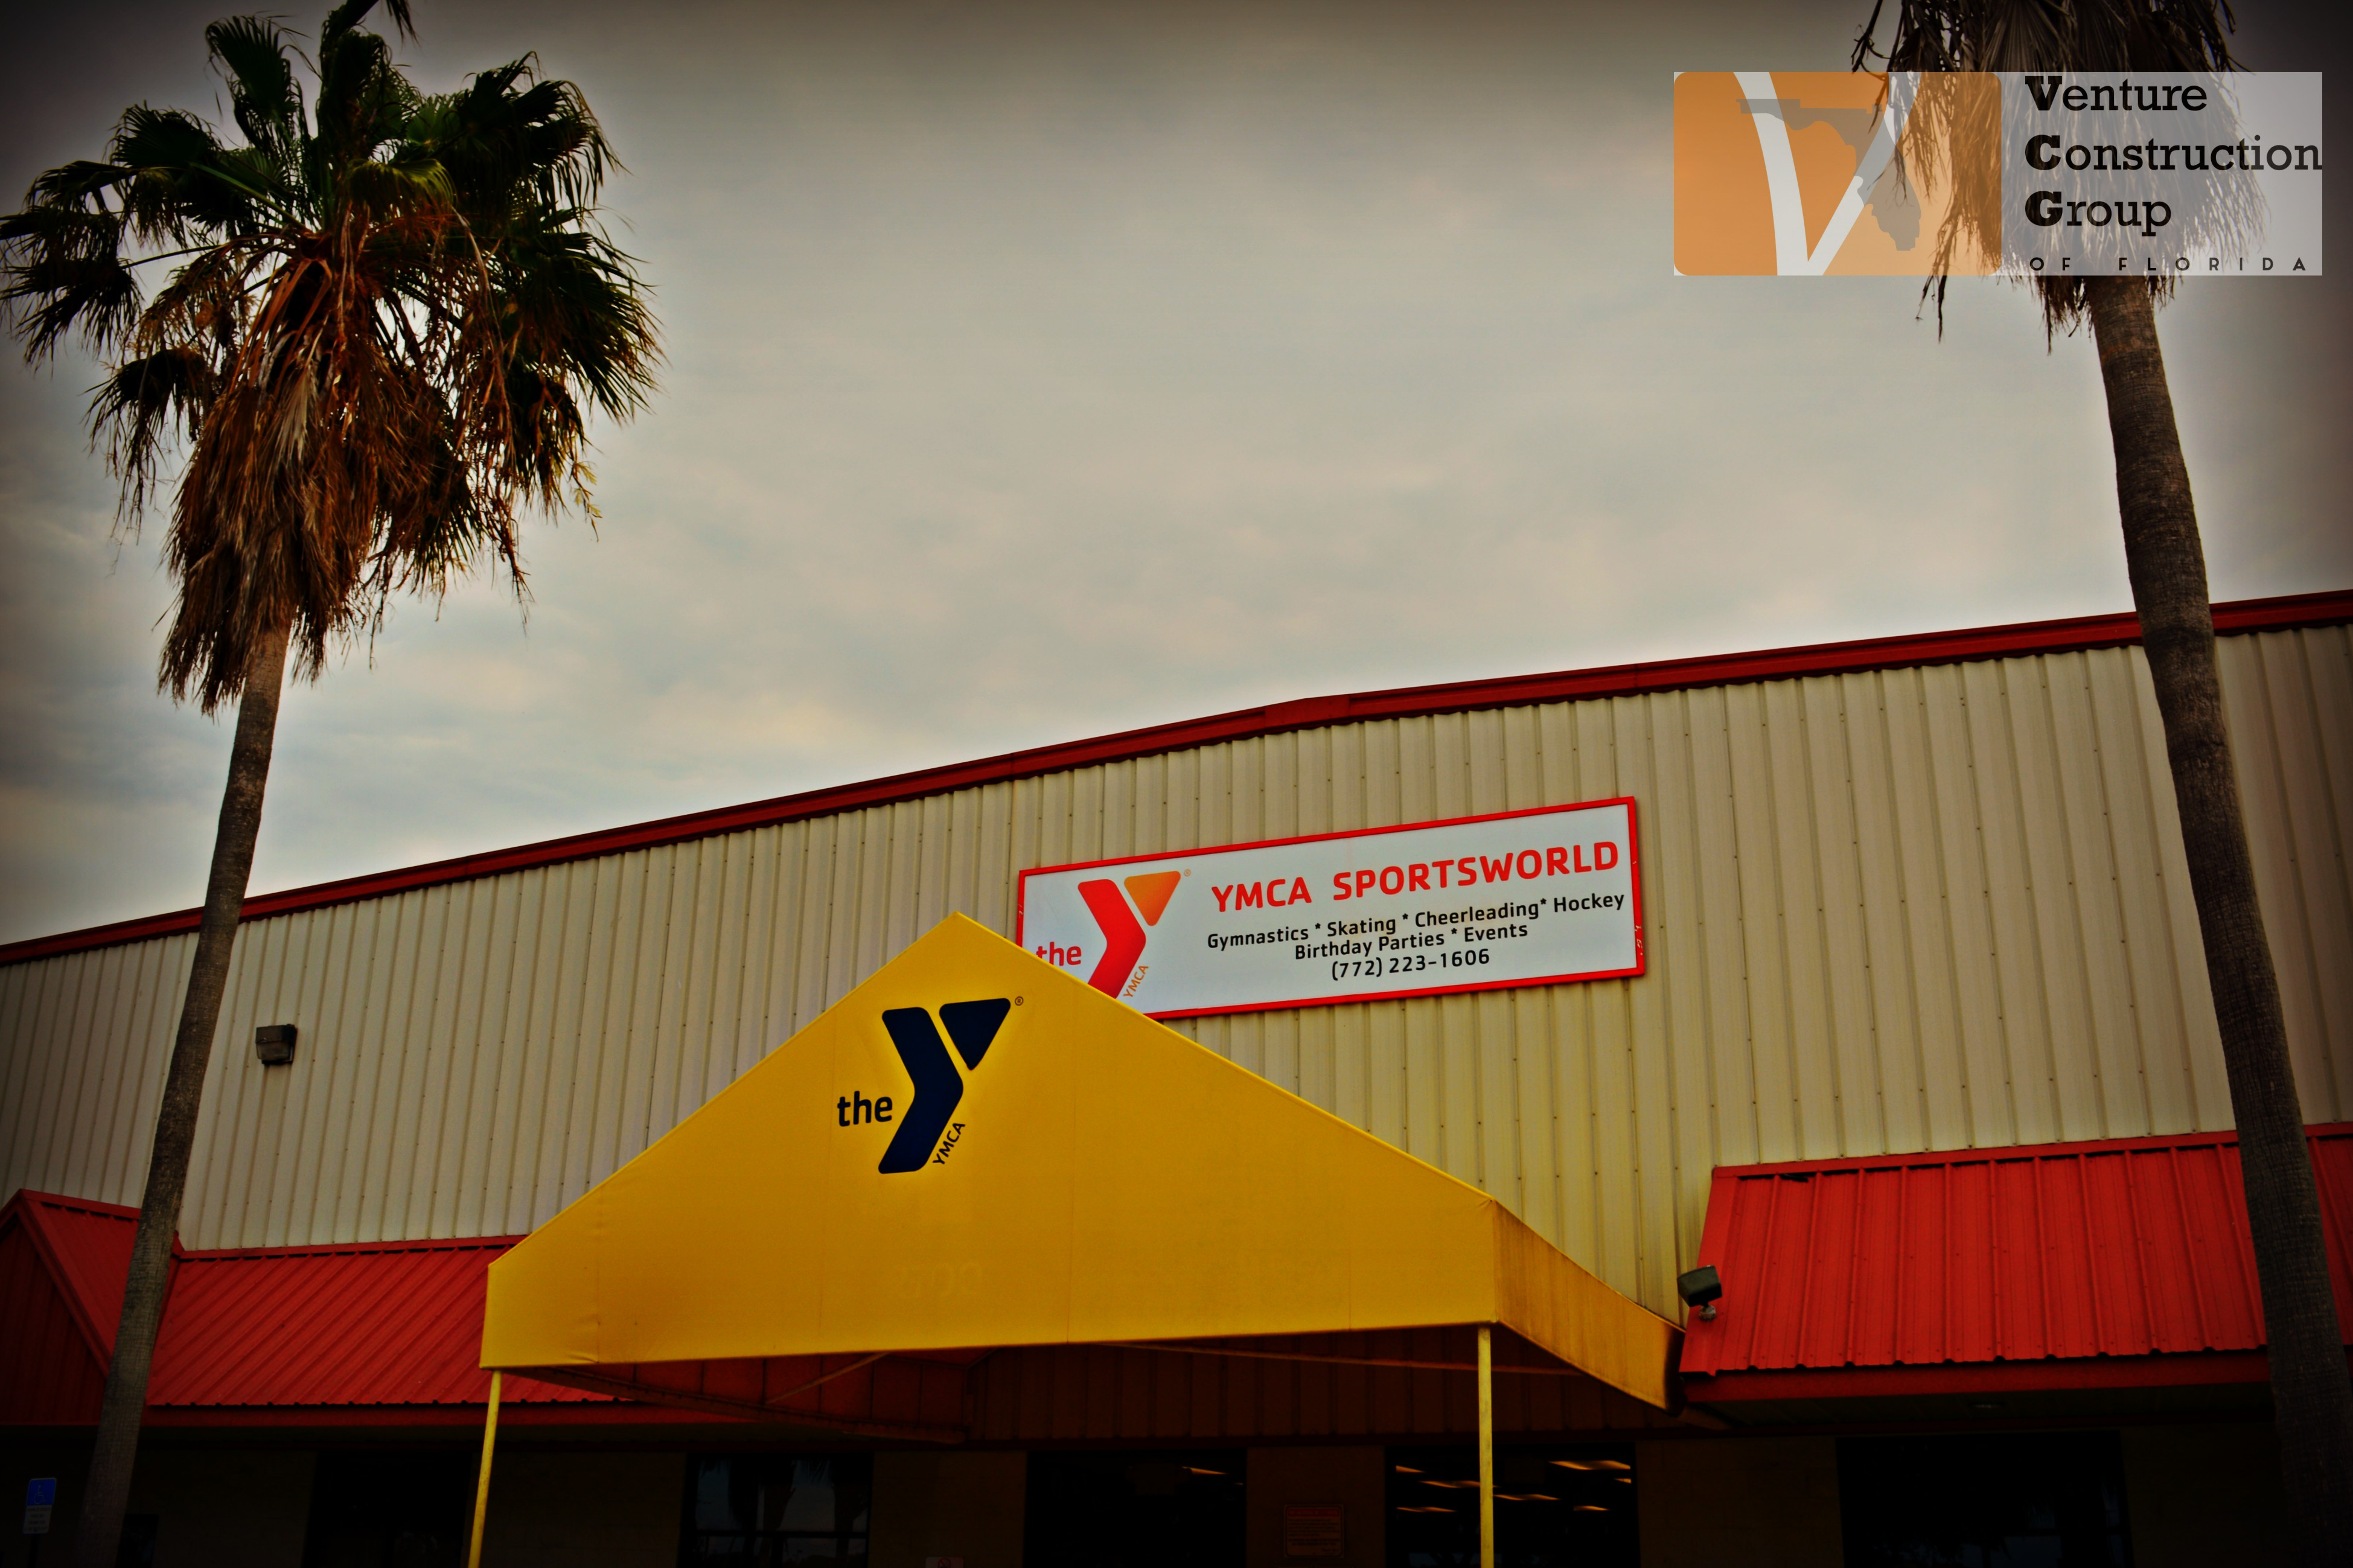 YMCA Sports World Venture Construction Group